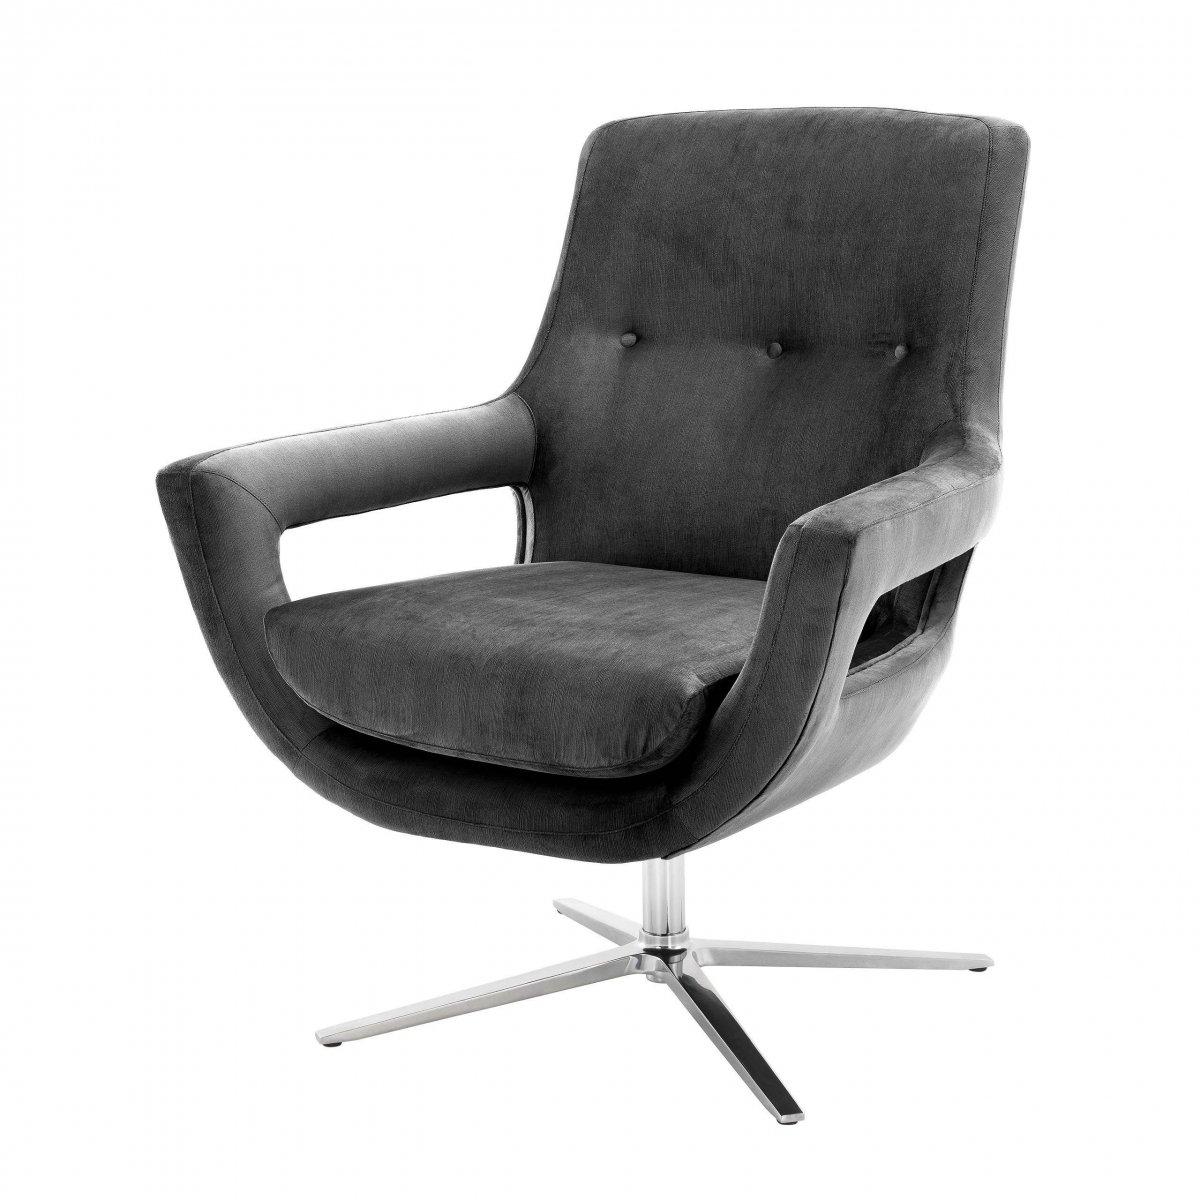 Кресло Eichholtz Swivel Chair Flavio Grey  - фото 1